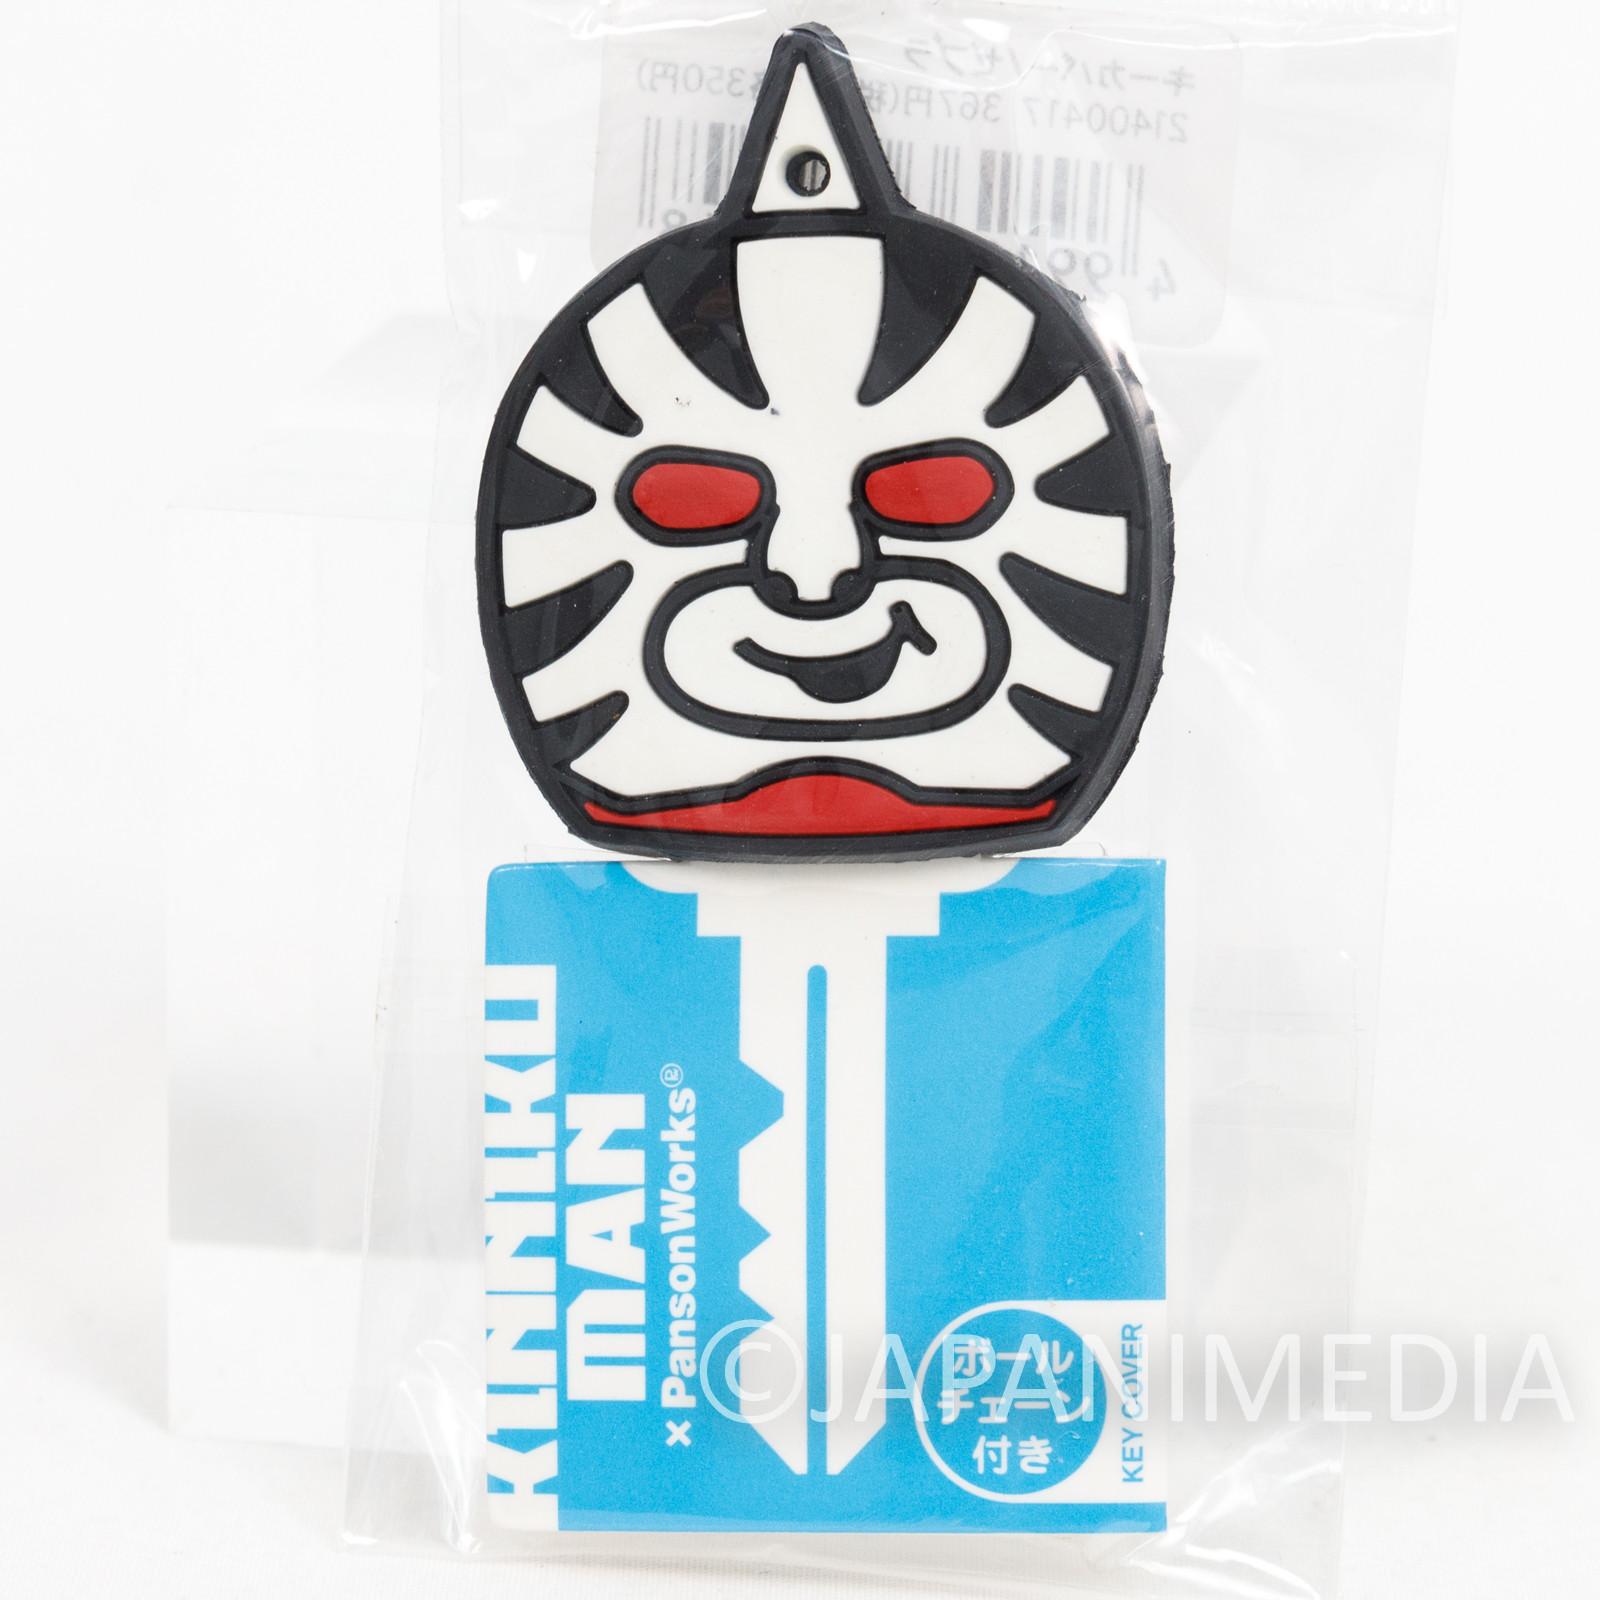 Kinnikuman x Panson Works Zebra Mascot Key Cover Ballchain ULTIMATE MUSCLE